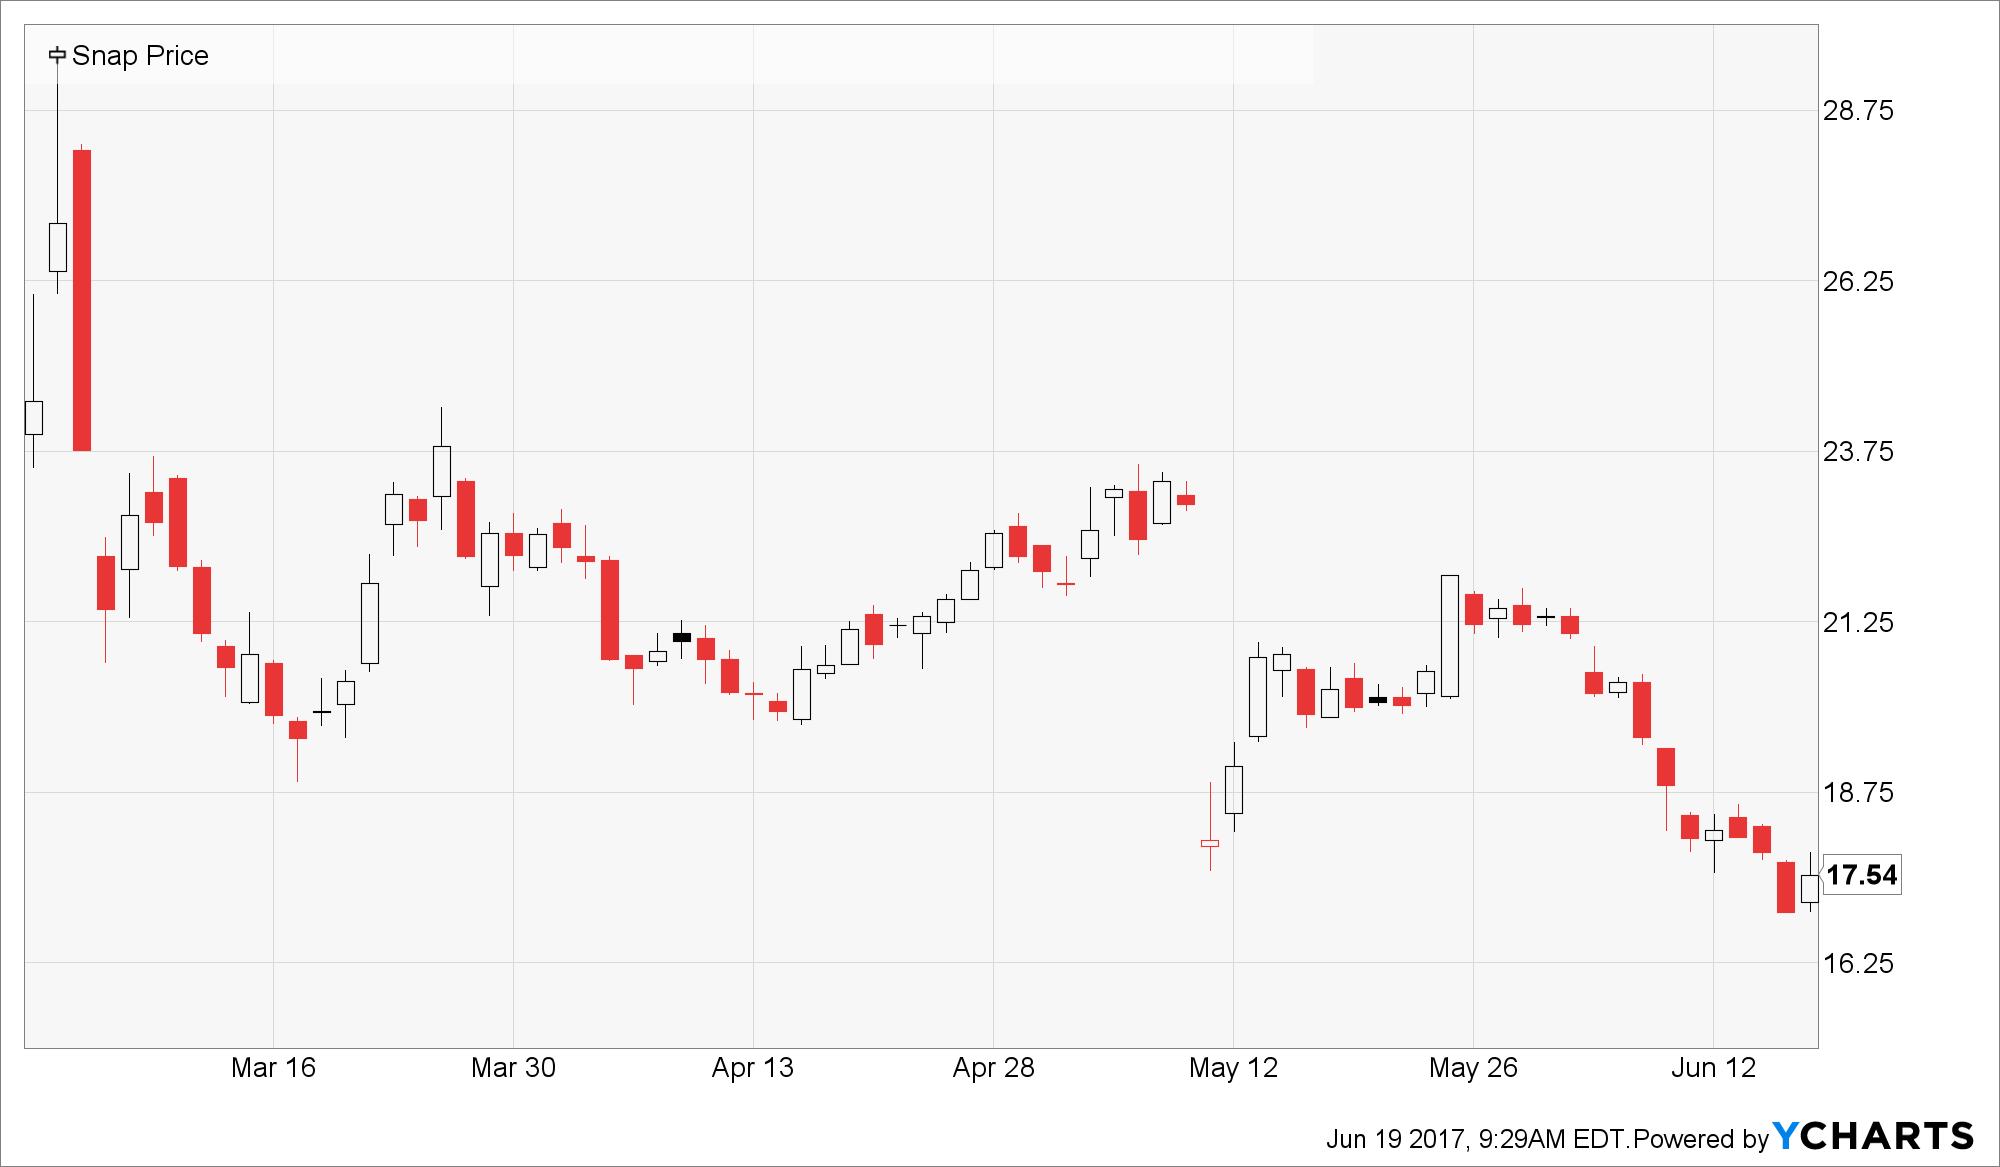 snapchat daily price chart